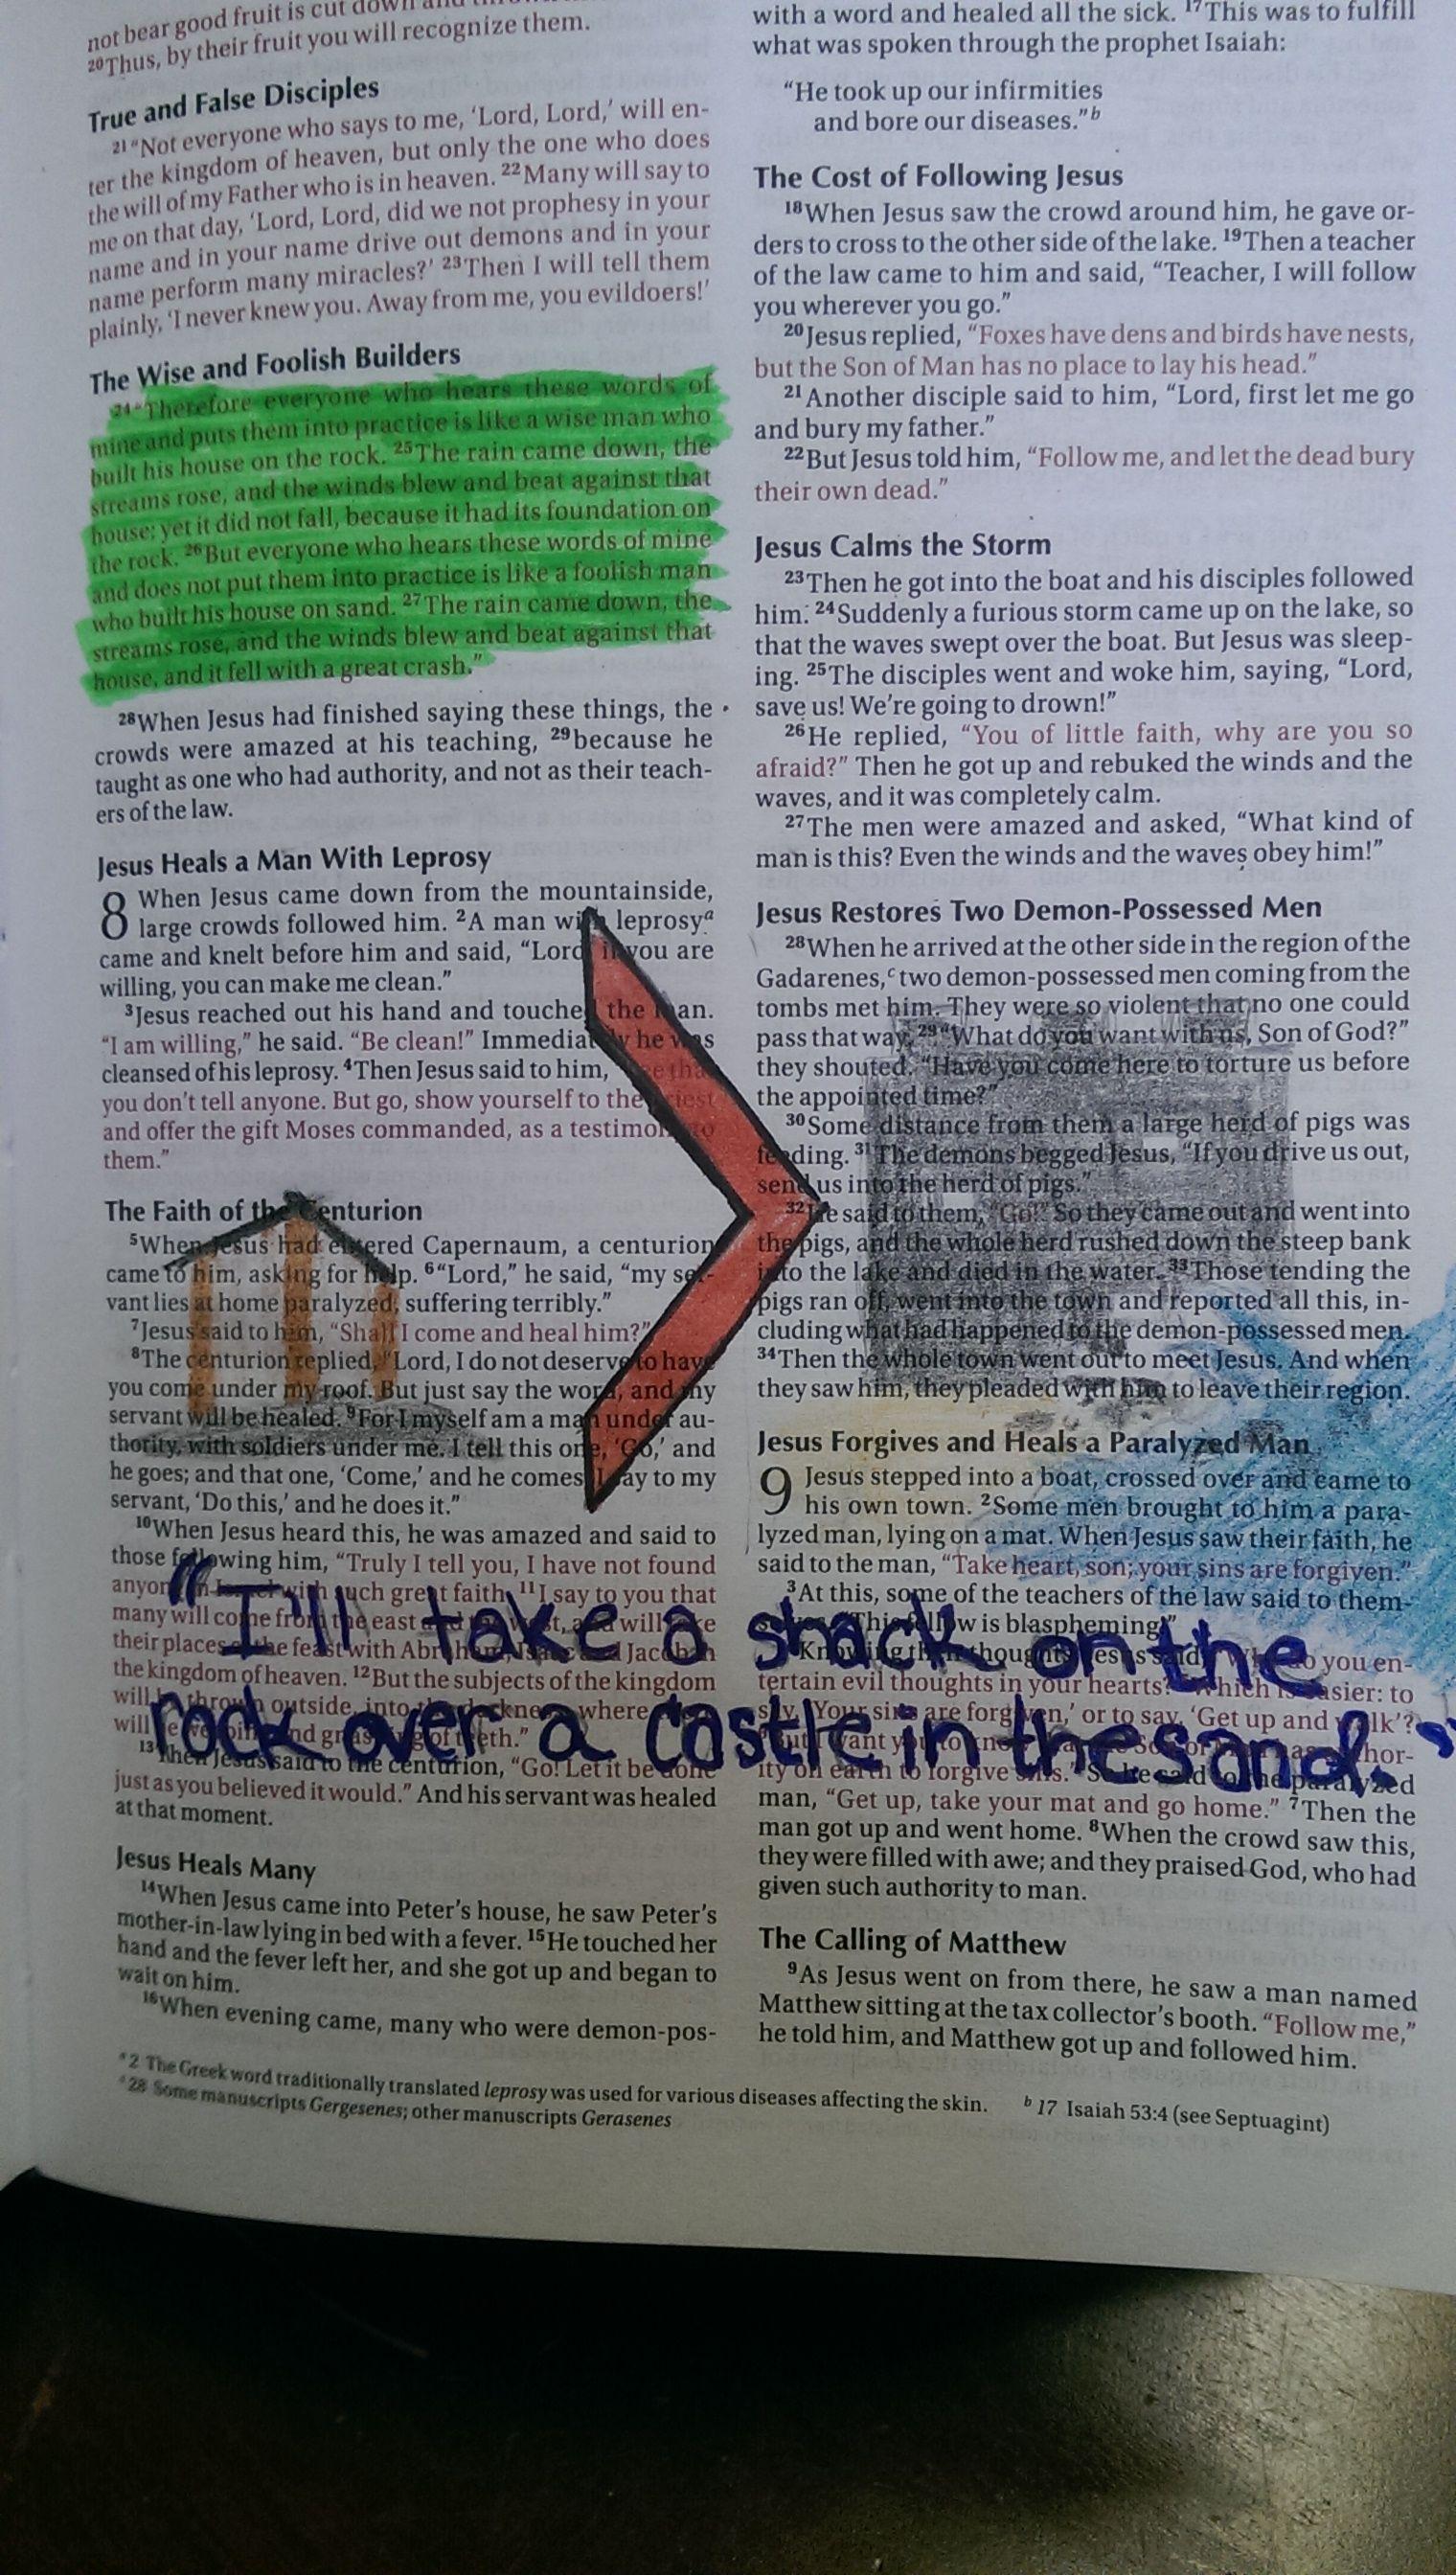 Matthew 7 24 27 W Casting Crowns American Dream Lyrics Gcse Maths Revision Gcse Math Math Notes [ 2688 x 1520 Pixel ]